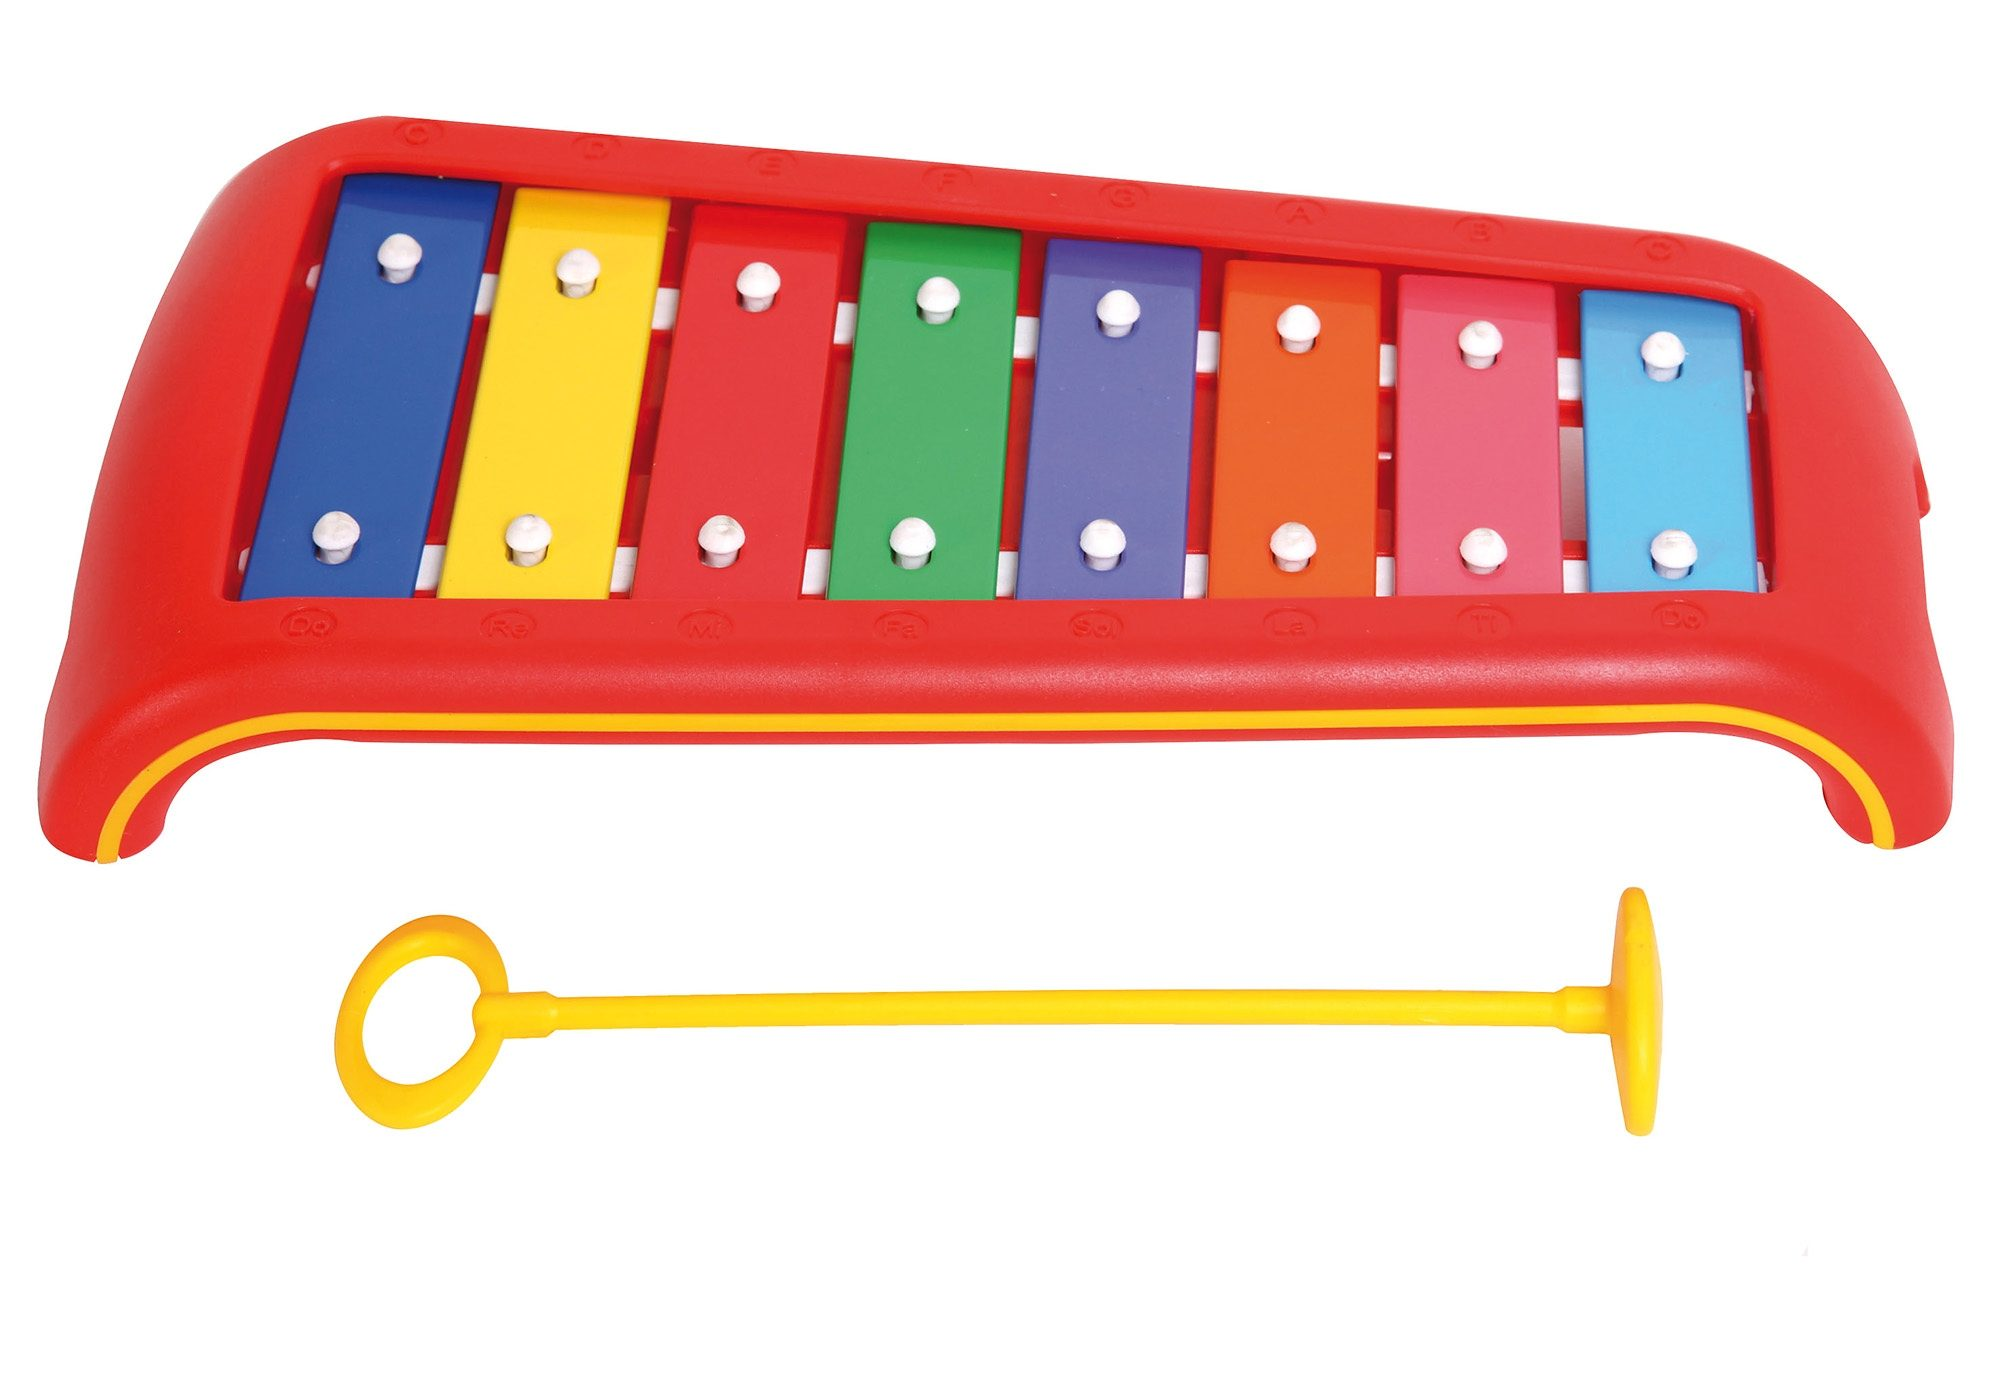 Kinder-Glockenspiel, Voggenreiter